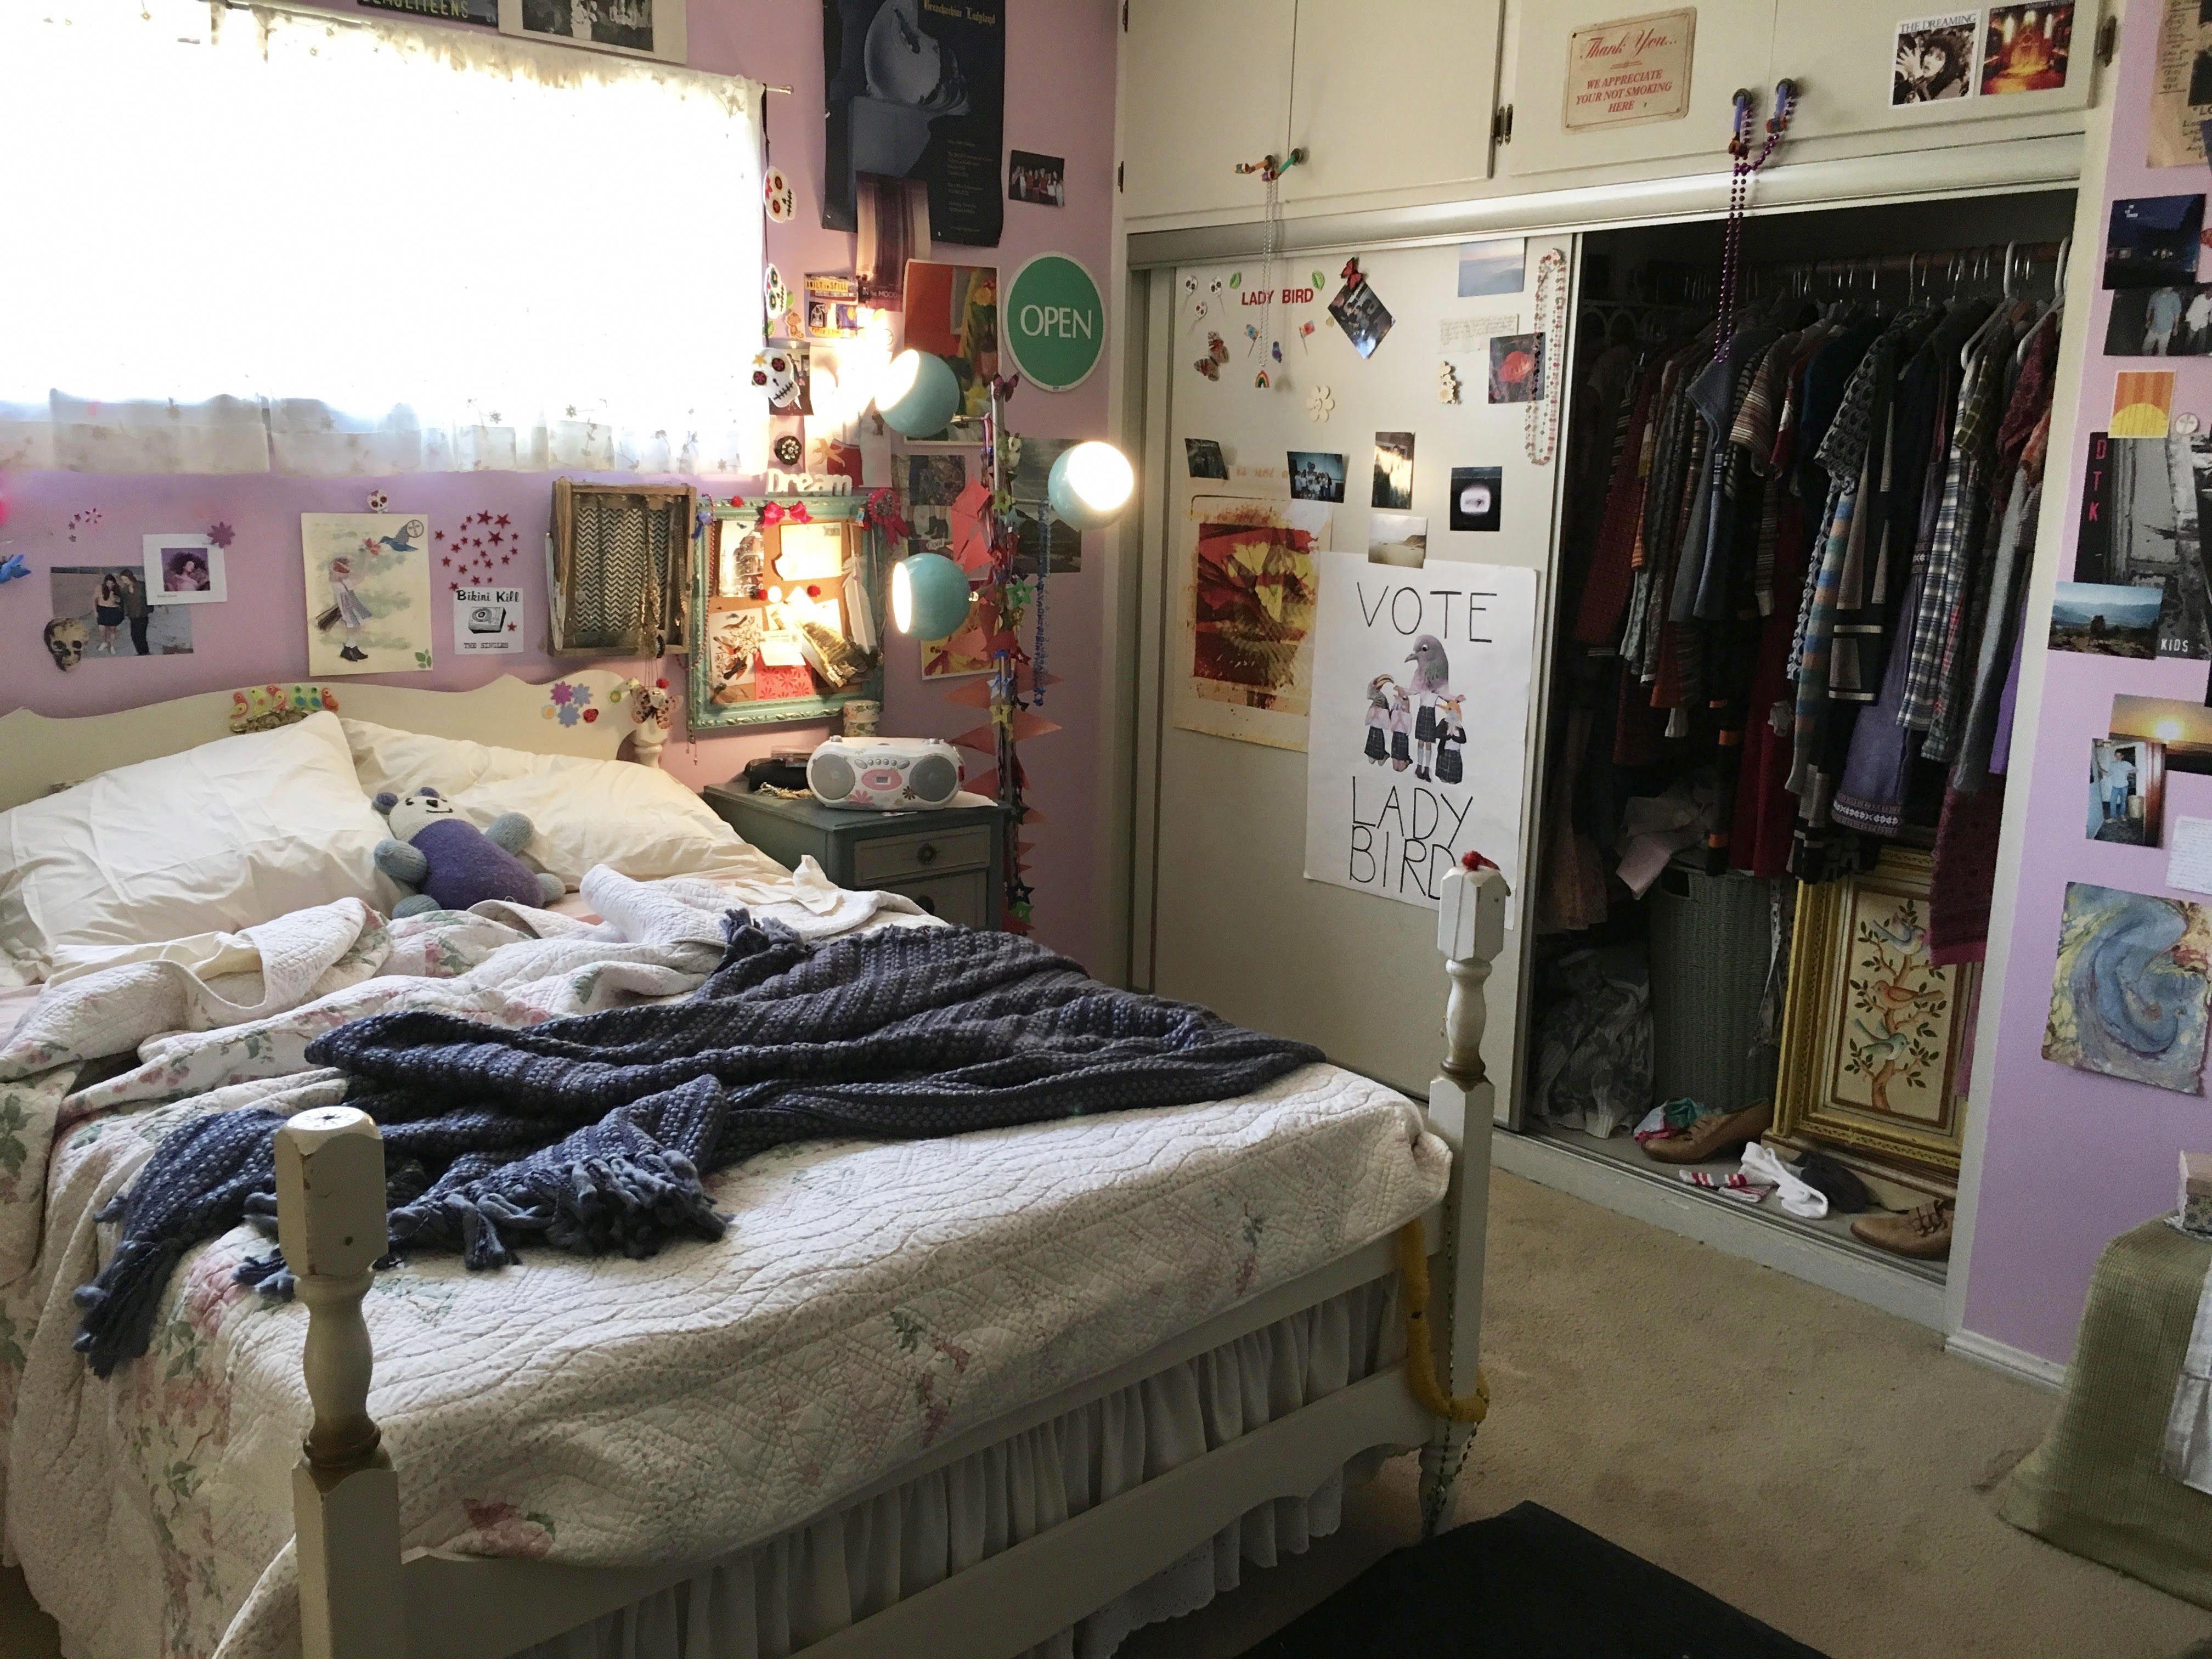 Here's How 'Lady Bird' Created An Iconic Teenage Bedroom